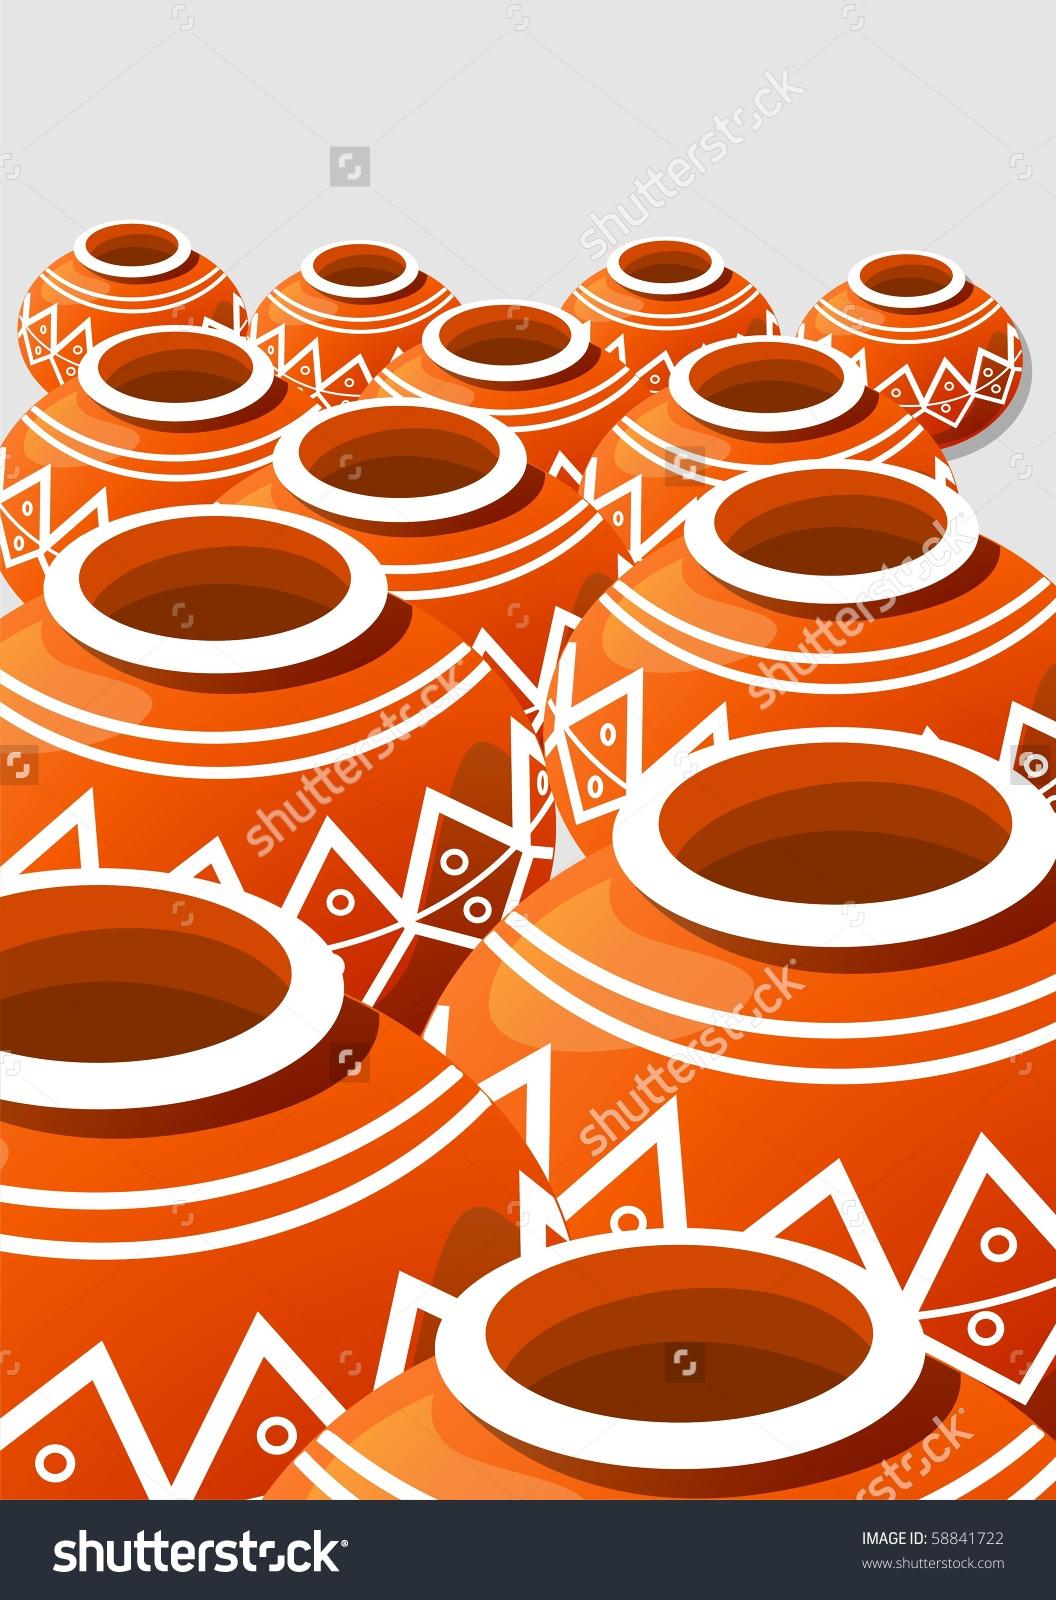 Illustration Of Earthen Pot With Design Work.